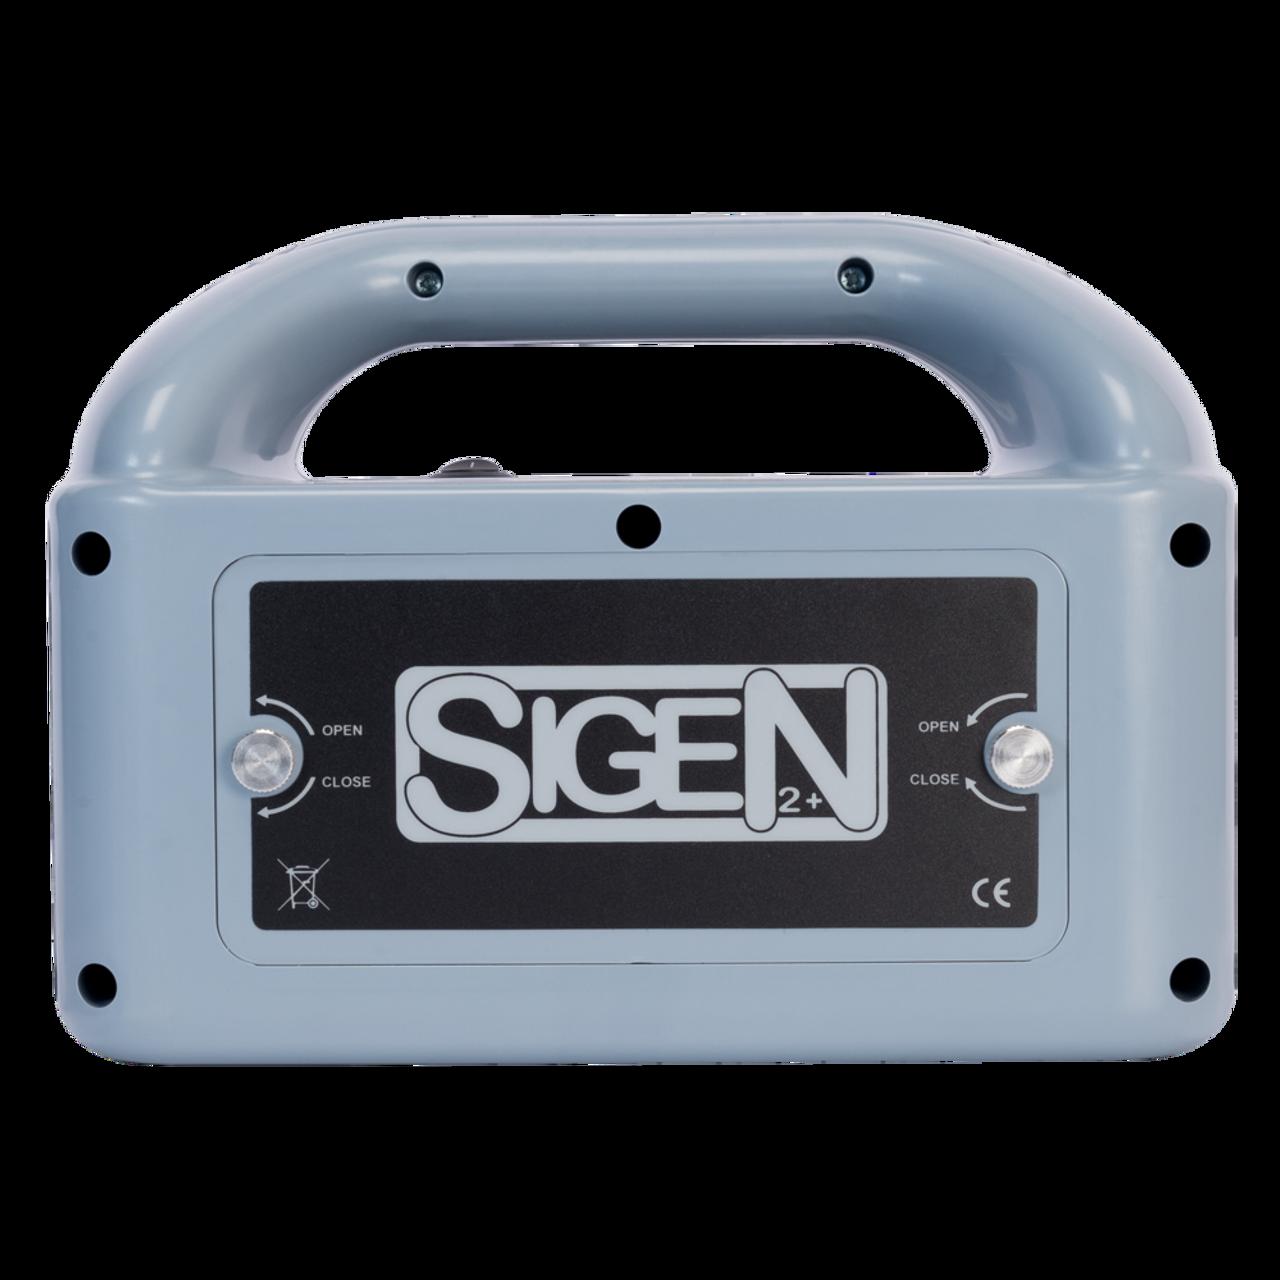 SiGen 2+